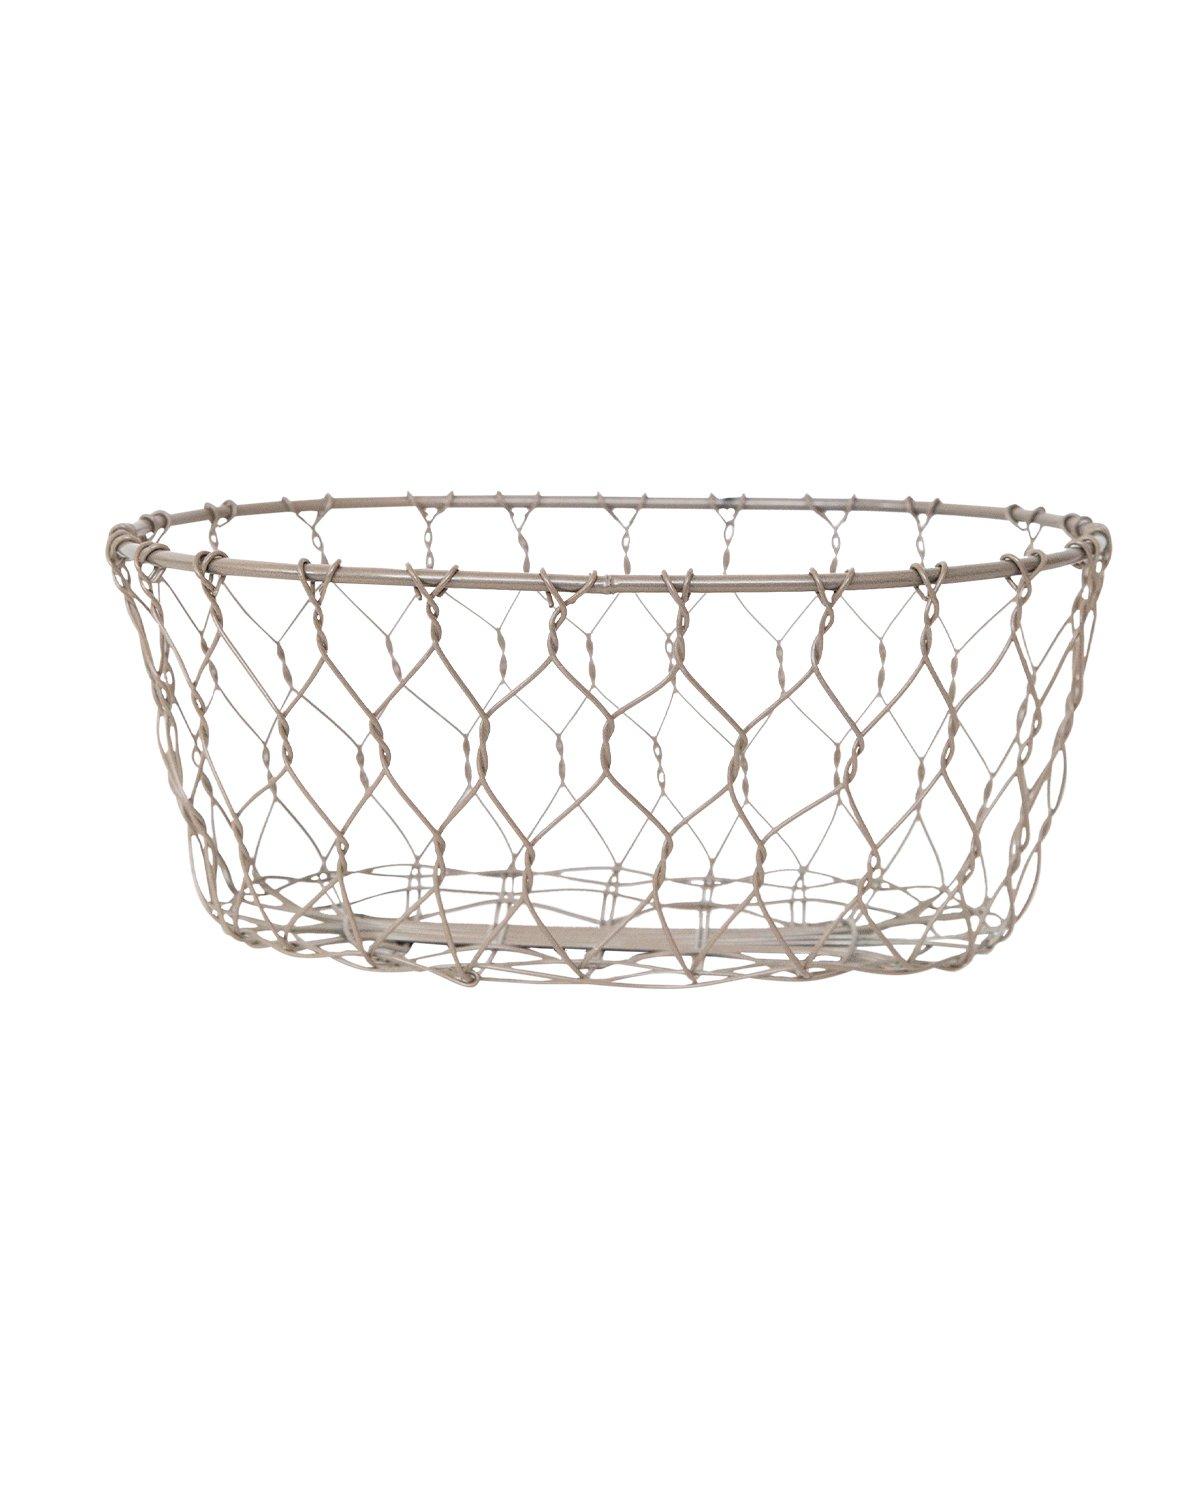 Metal_Wire_Basket1_b419e734-8c51-4576-8e48-117bfbc70558.jpg